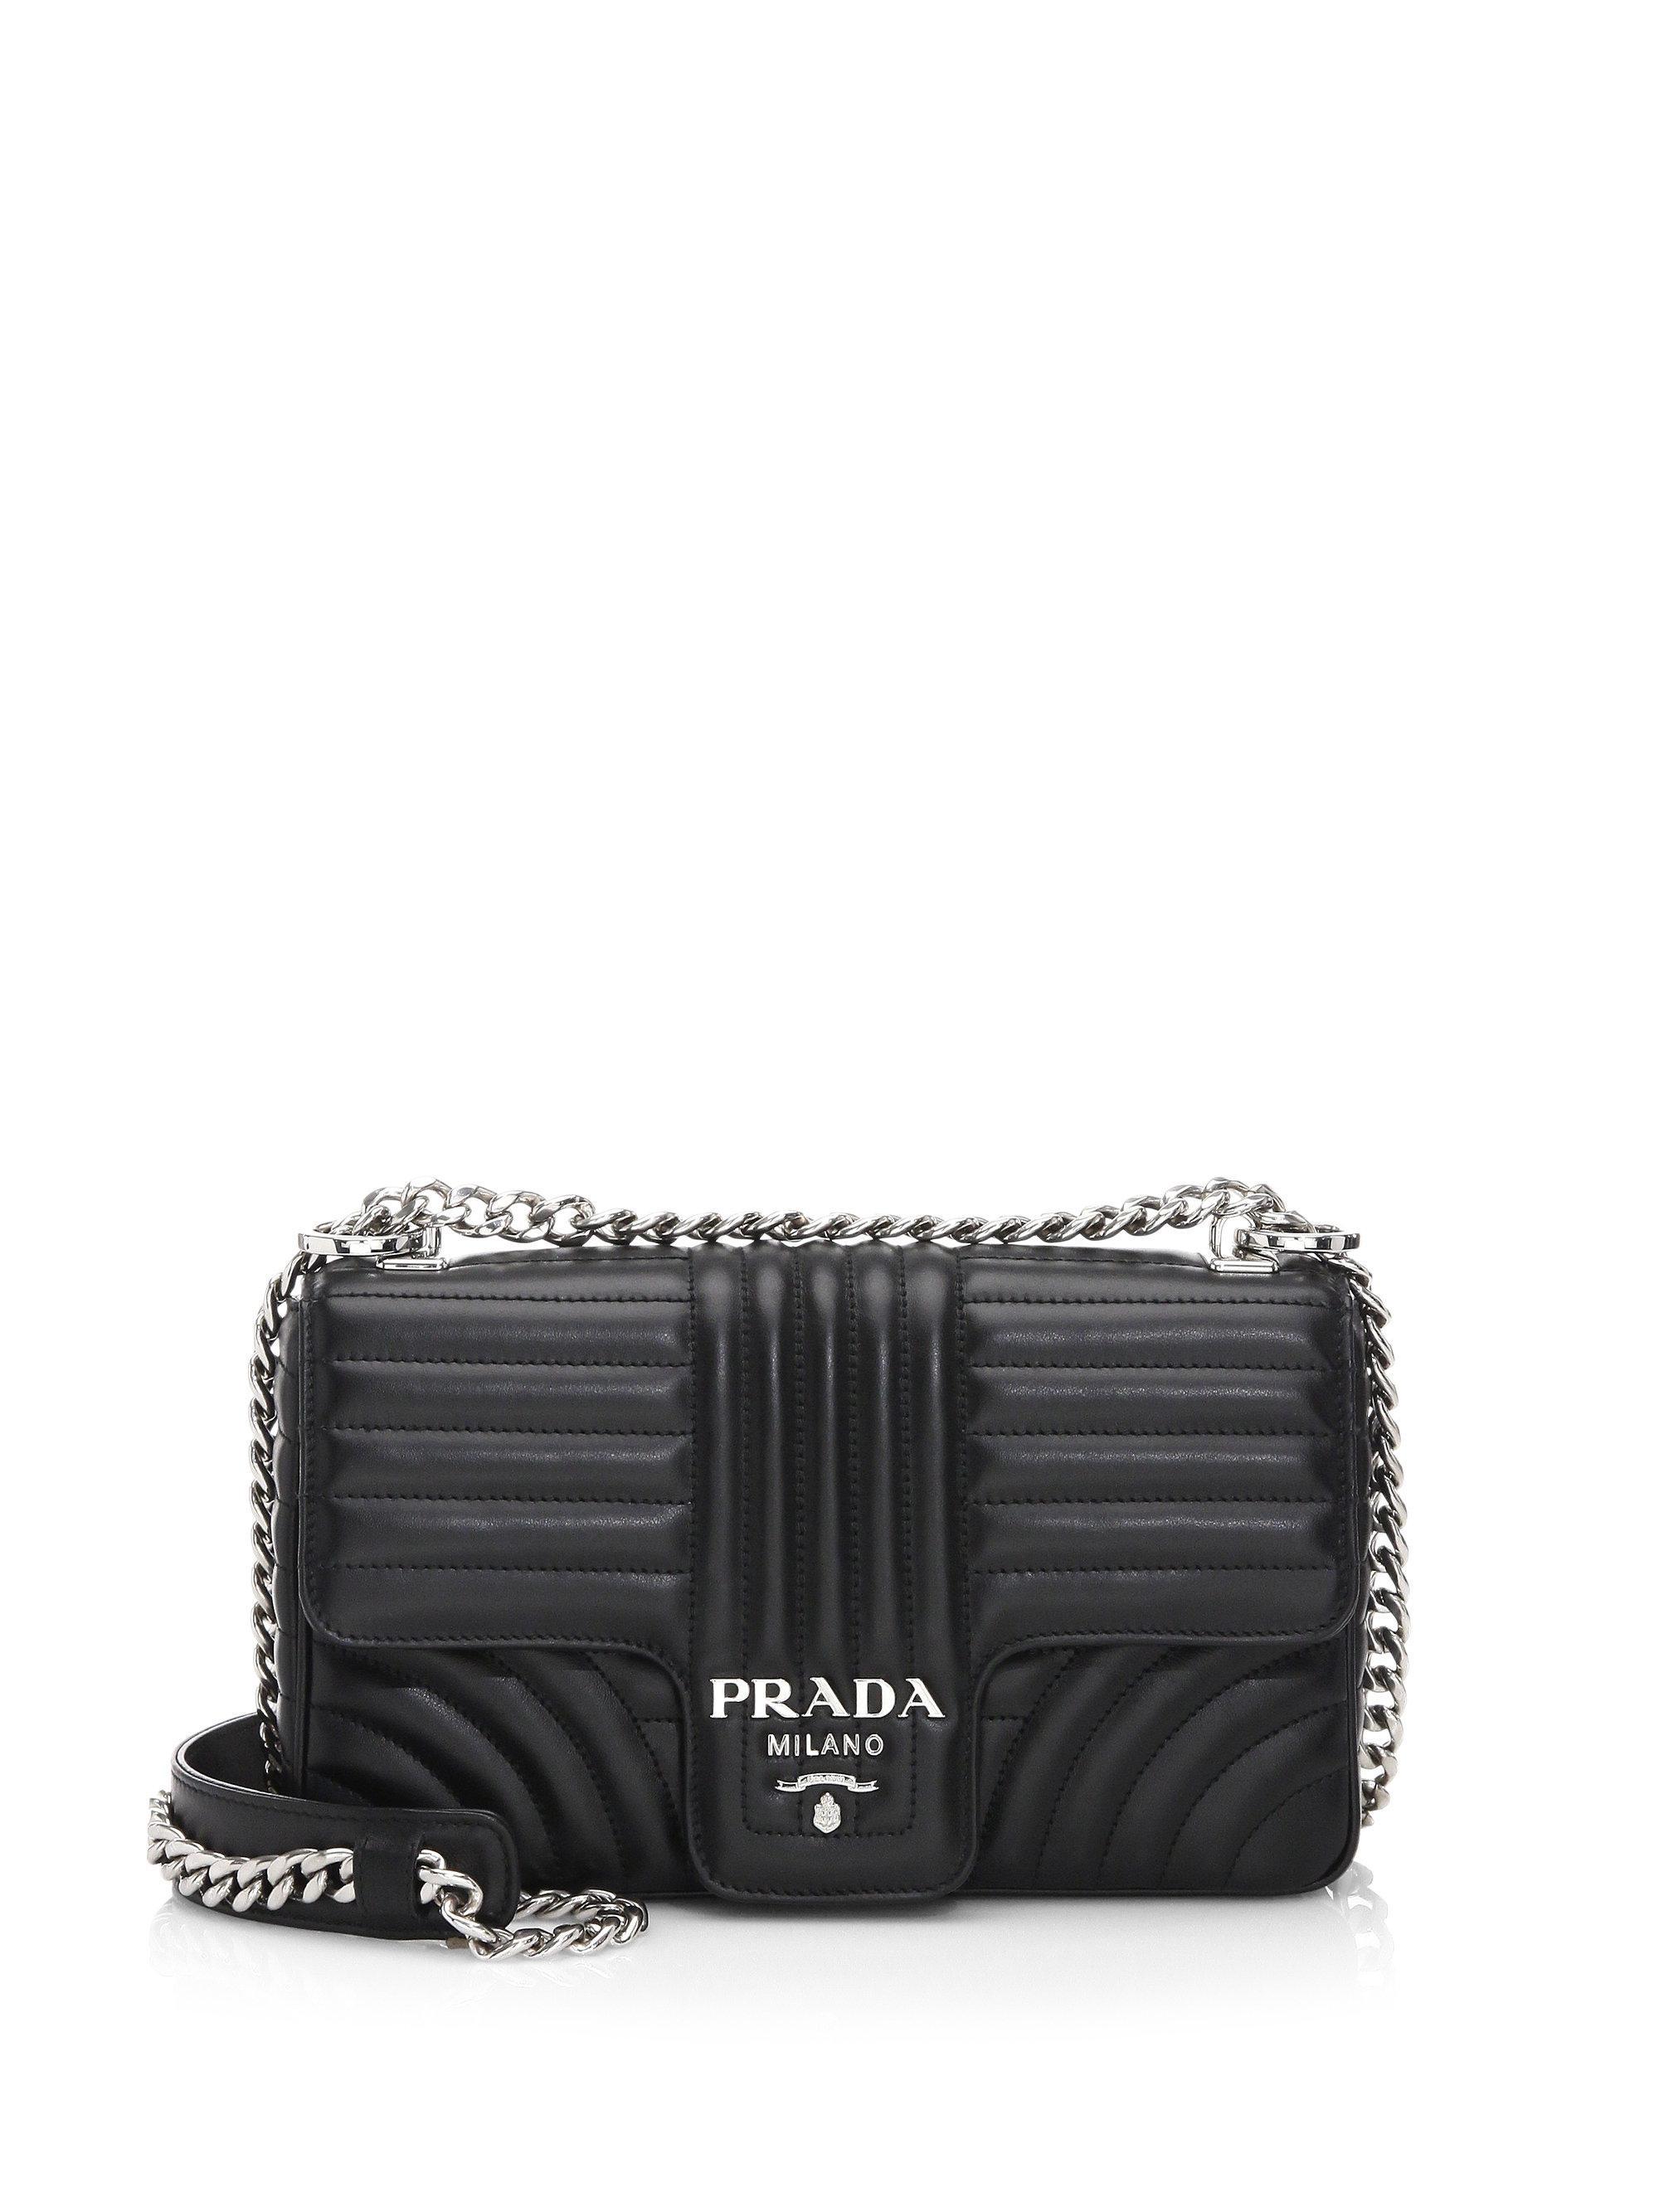 e8fa42914c82 ... where can i buy prada black medium diagramme leather shoulder bag lyst.  view fullscreen f2b41